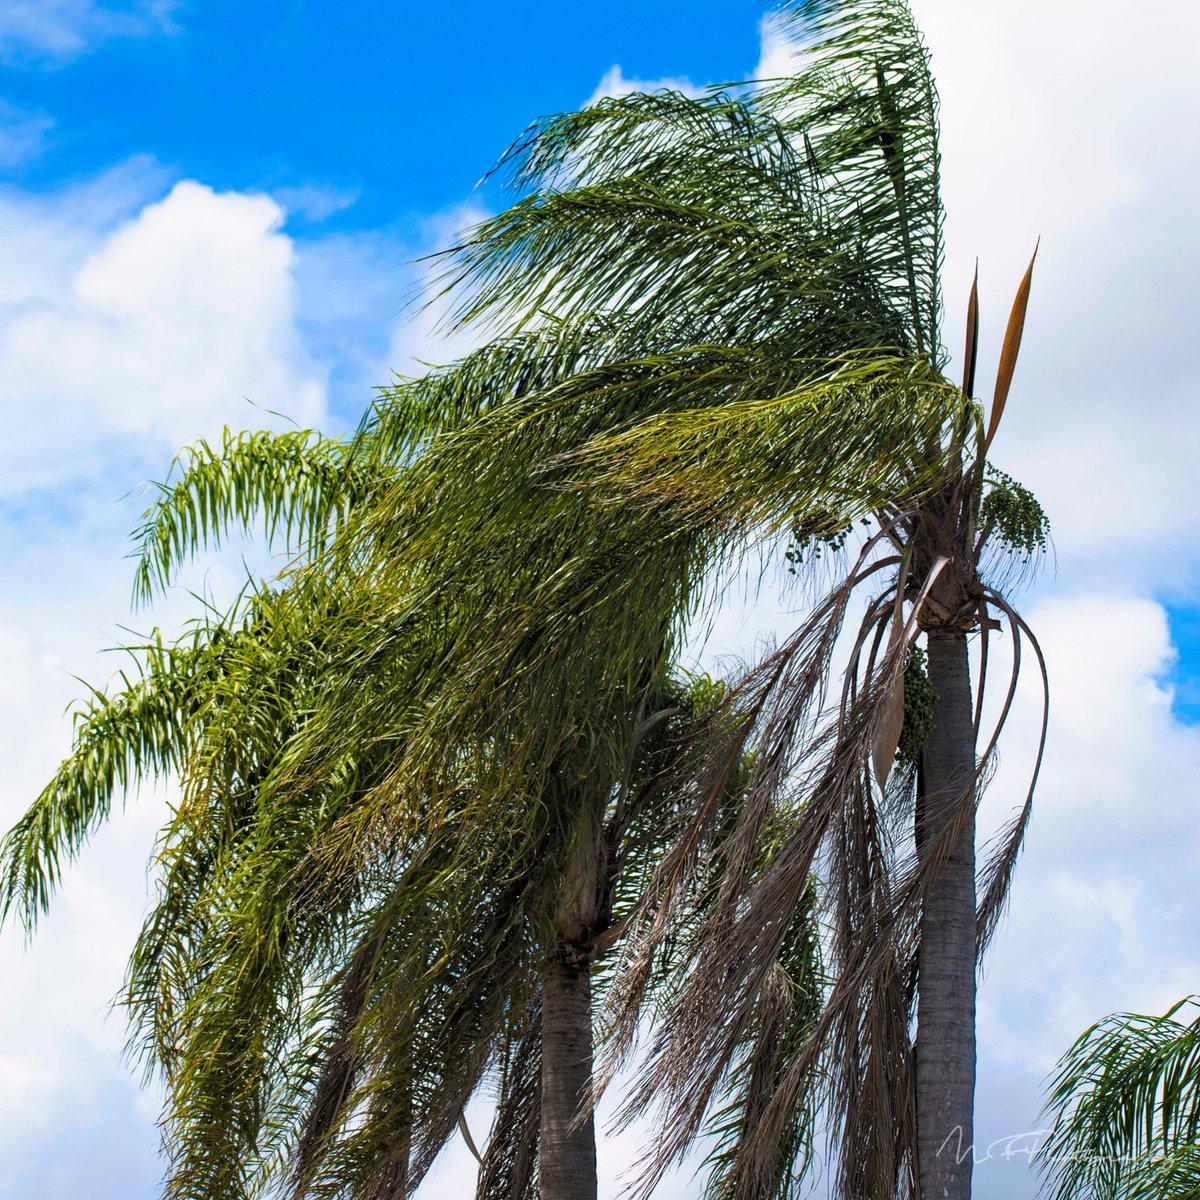 #ruleofthirds #photography #macrophotography #naturephotography #Nature #CloseUp #Outdoors #TropicalClimate https://t.co/nugU9nzoOH